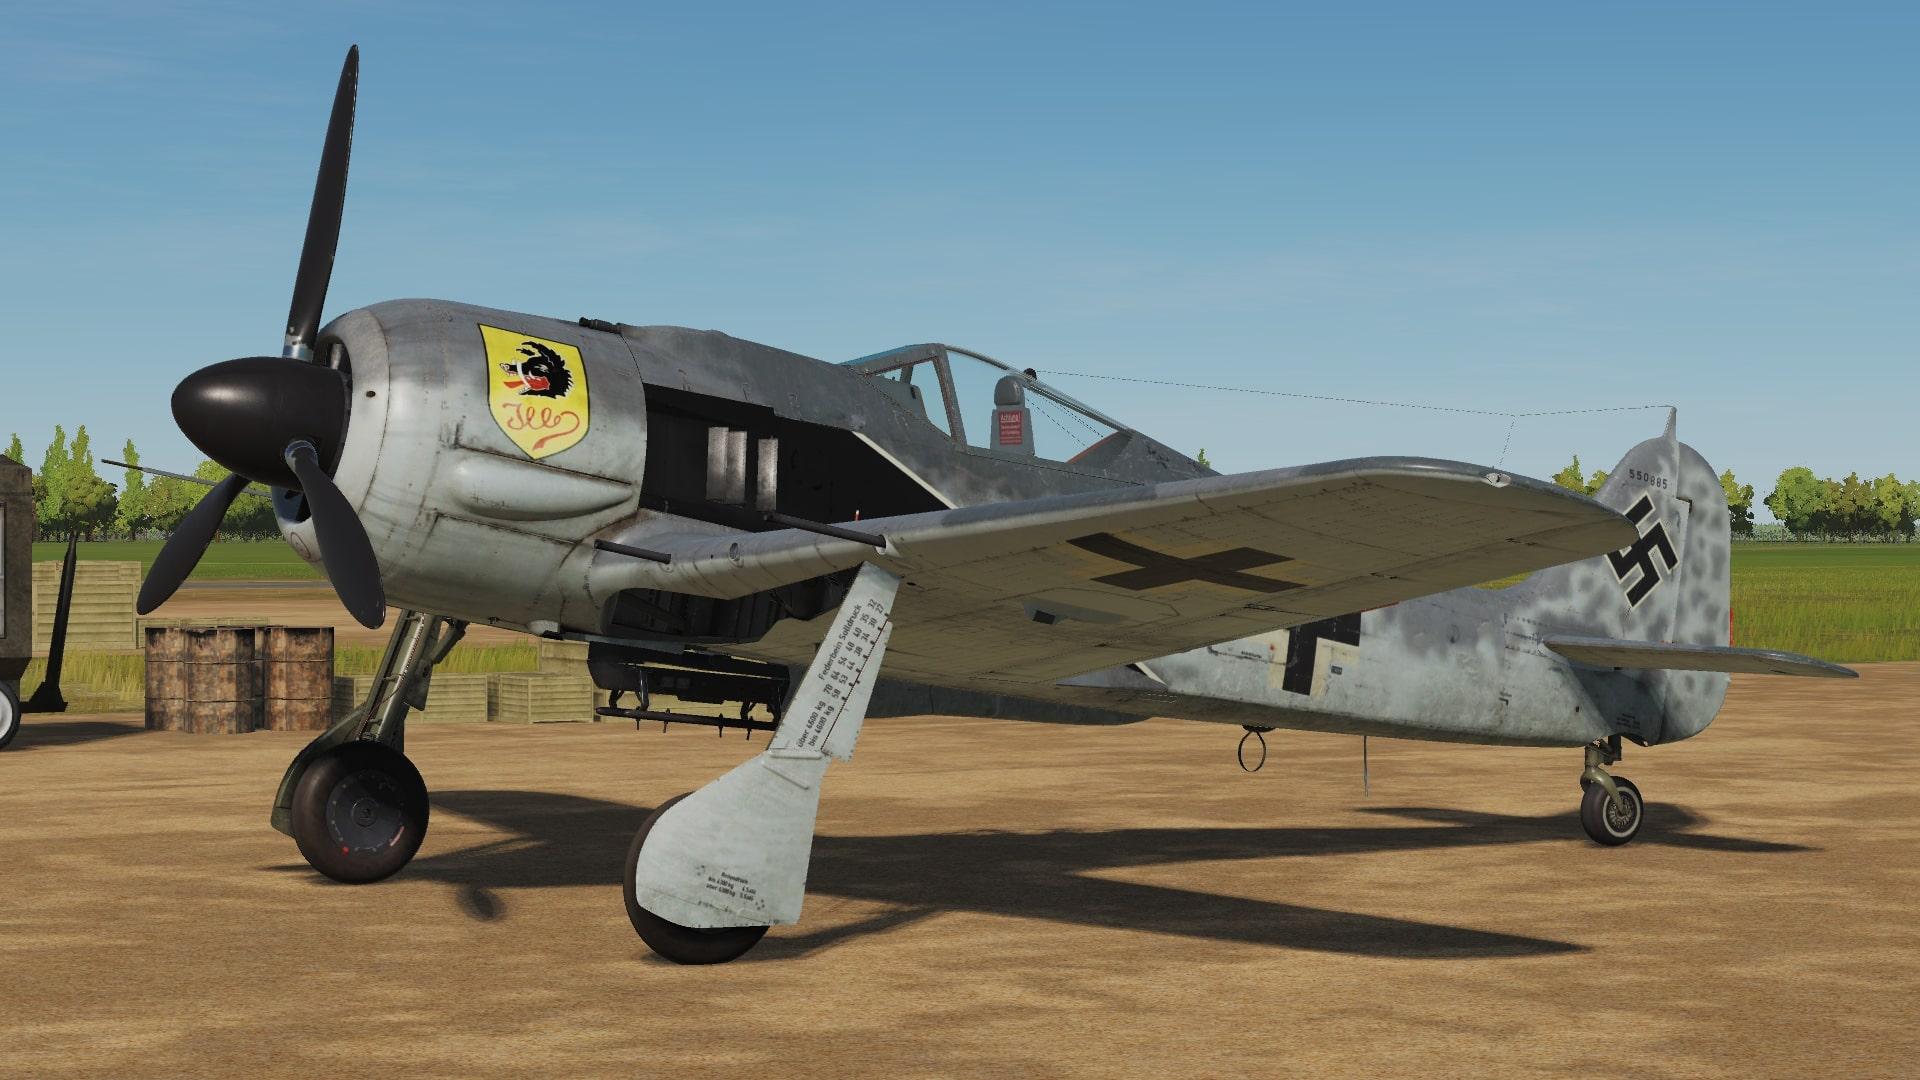 Focke Wulf 190 From Classic Hangar | The German Classic